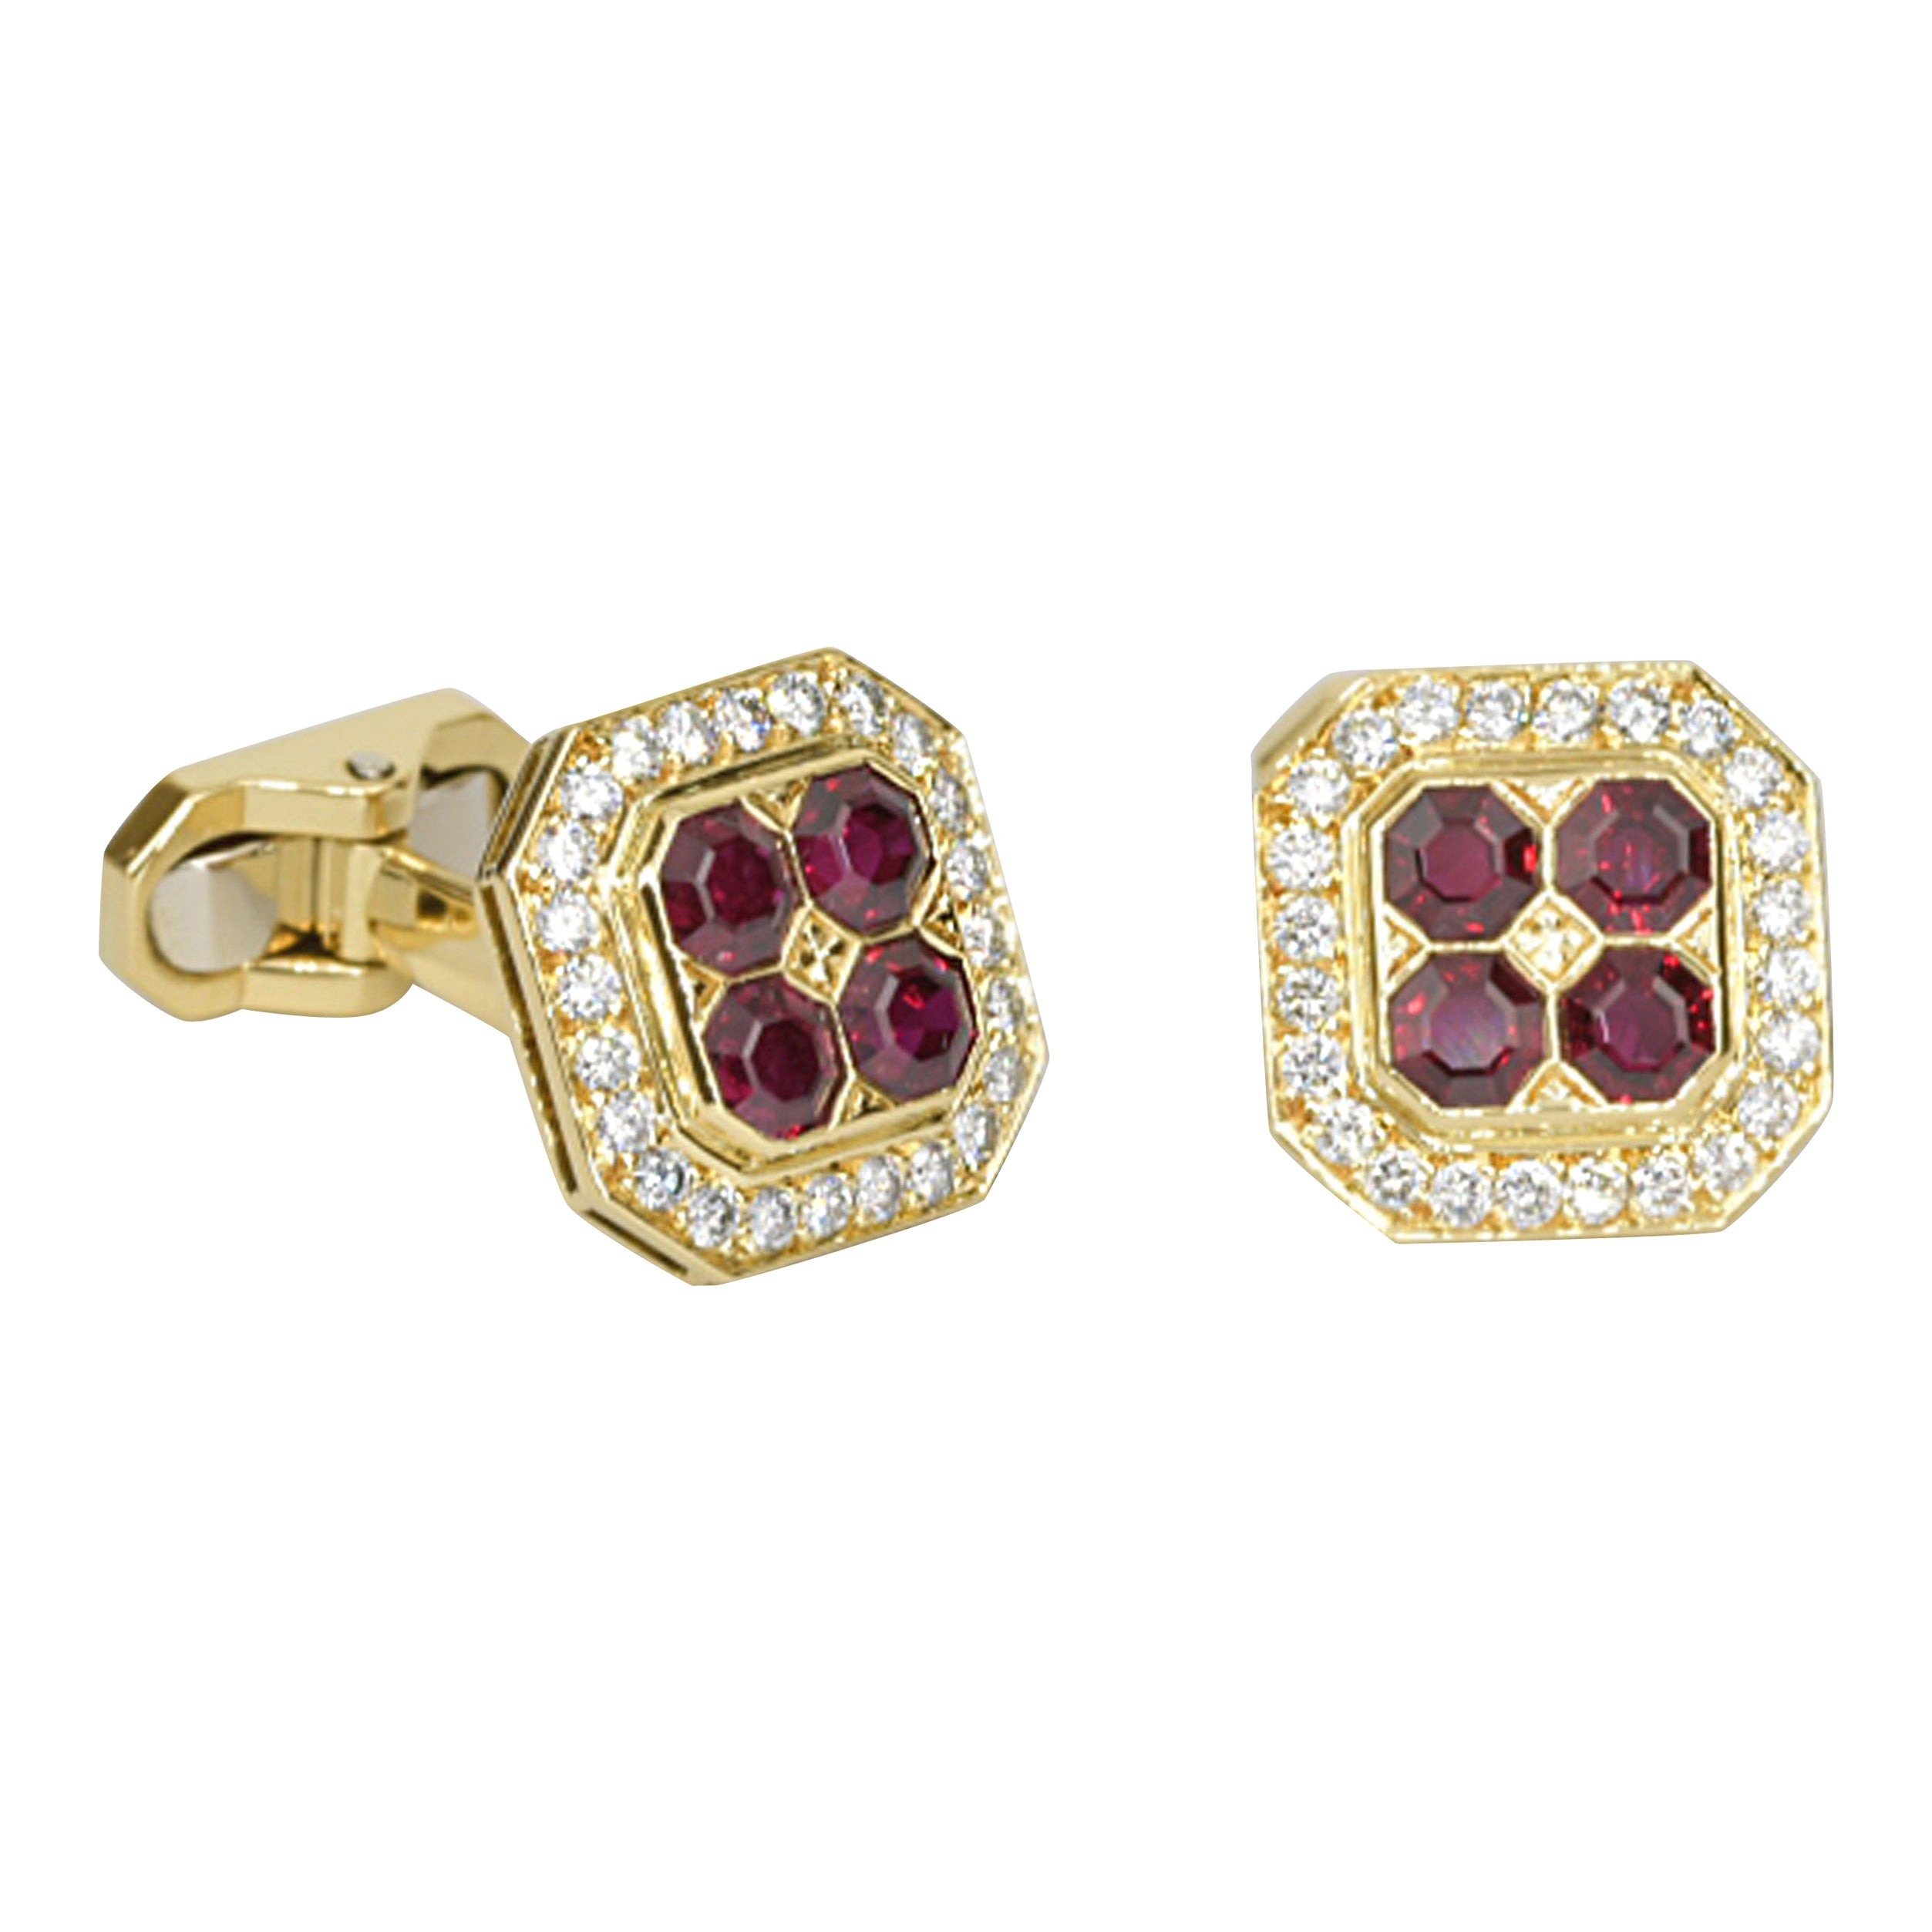 Matthew Cambery 18 Karat Yellow Gold Ruby and Diamond Cufflinks